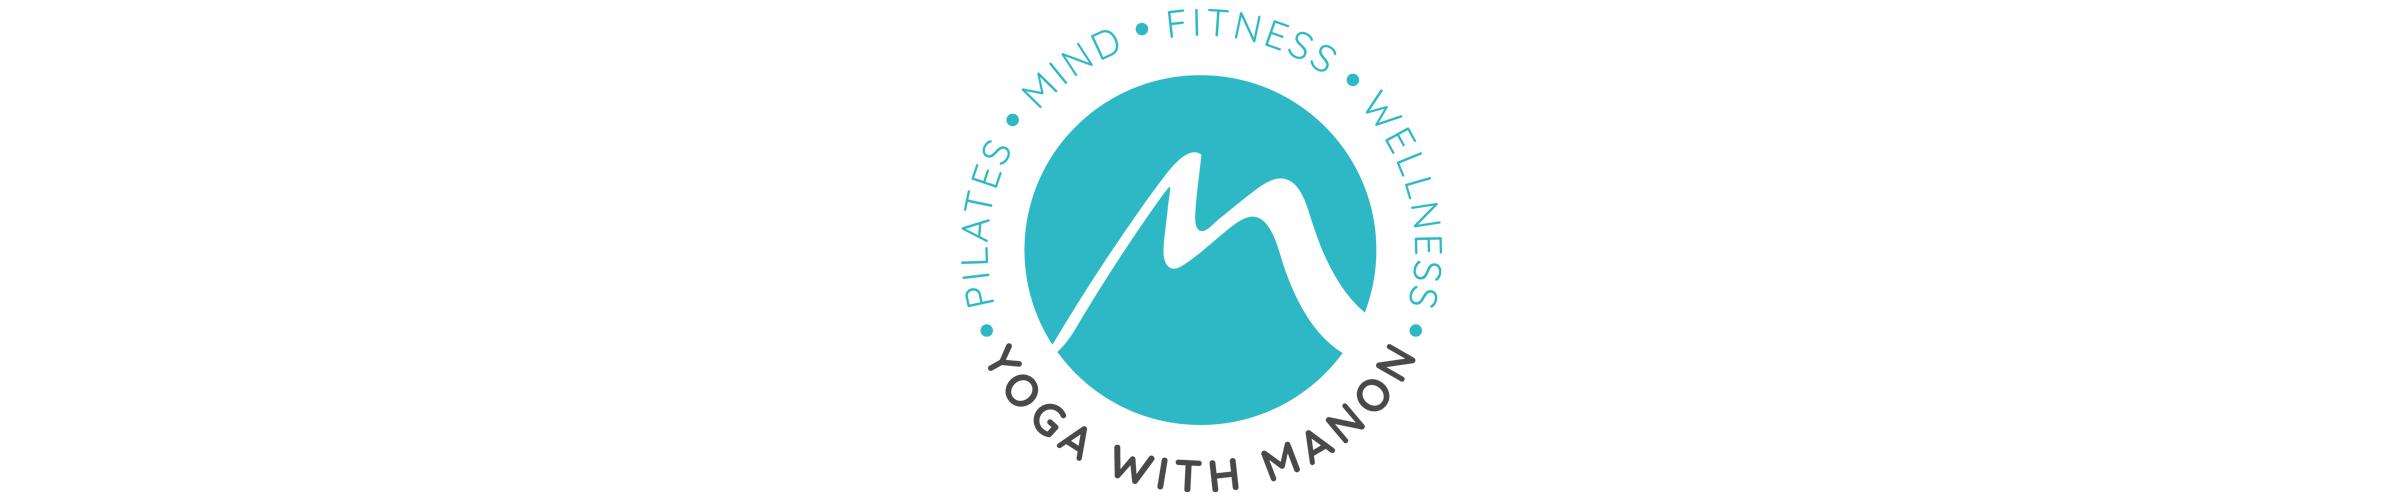 Yoga with Manon